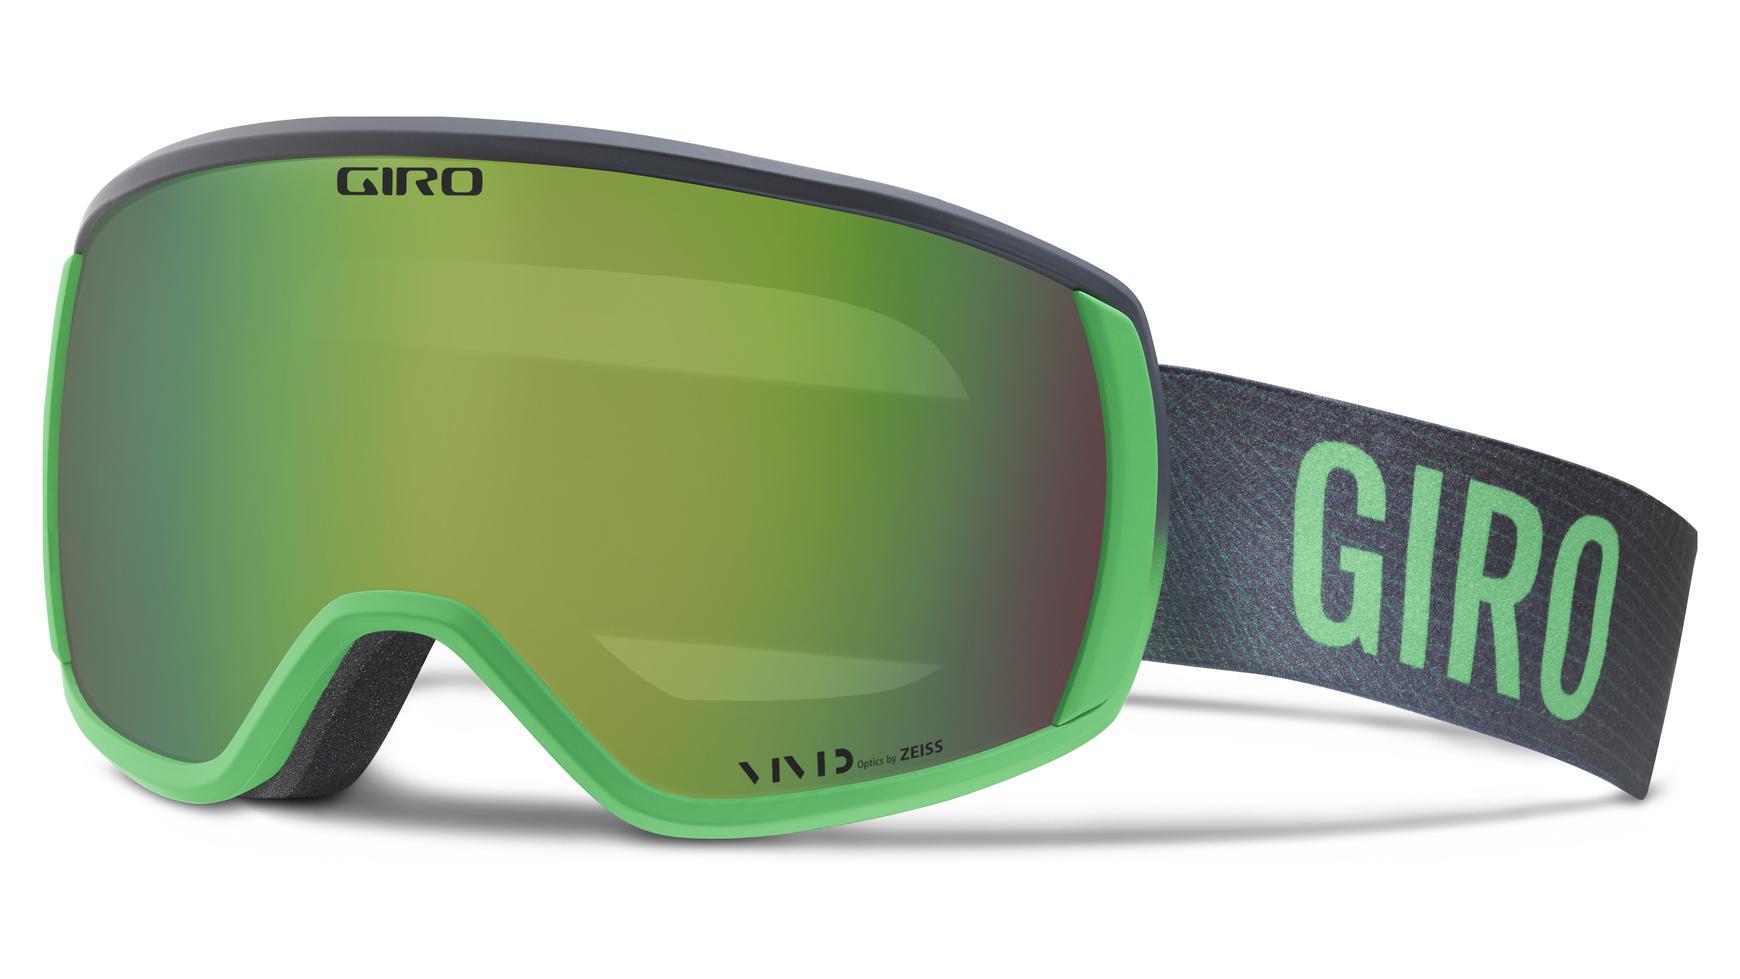 300057010-giro_g_balance_brightgreenturbulencefaded_vividemerald